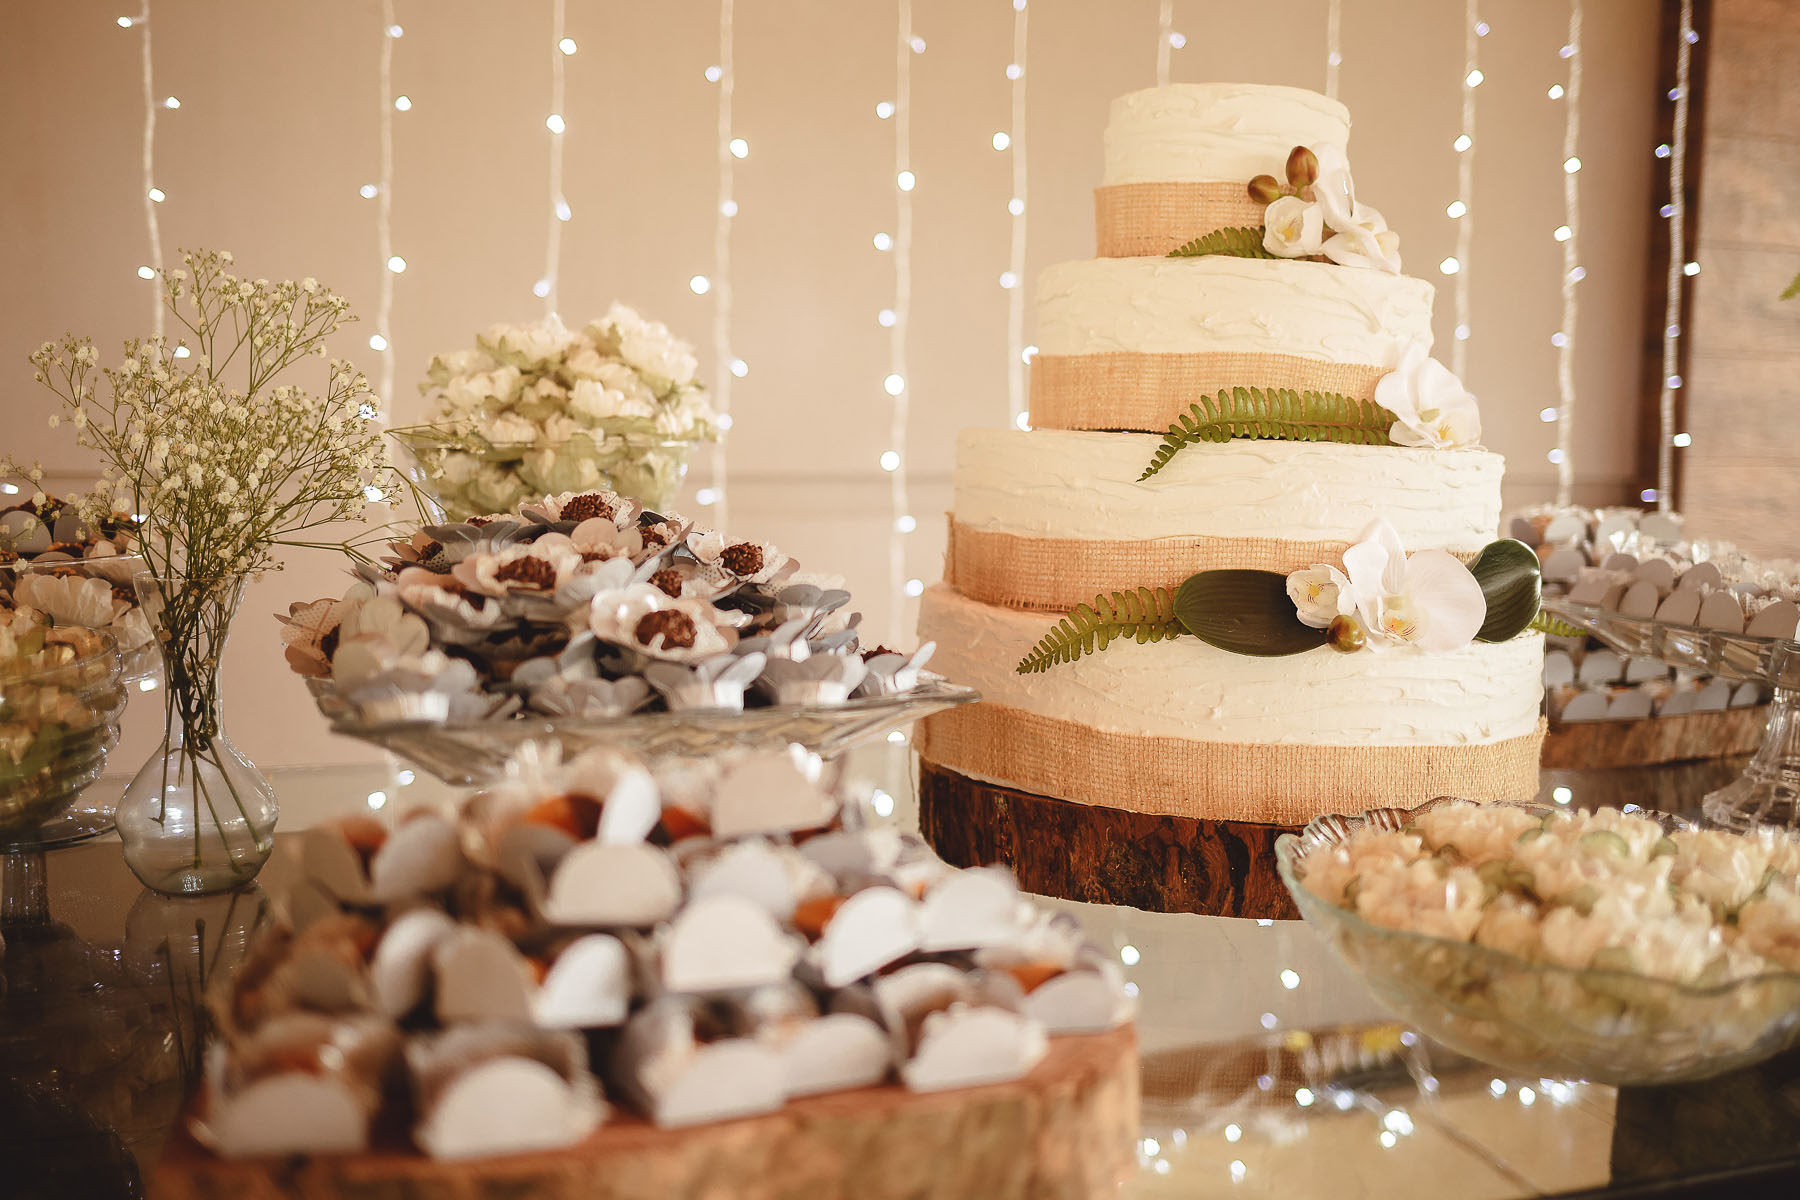 Bolo Fake de Casamento DIY com Isopor para Economizar no Casamento